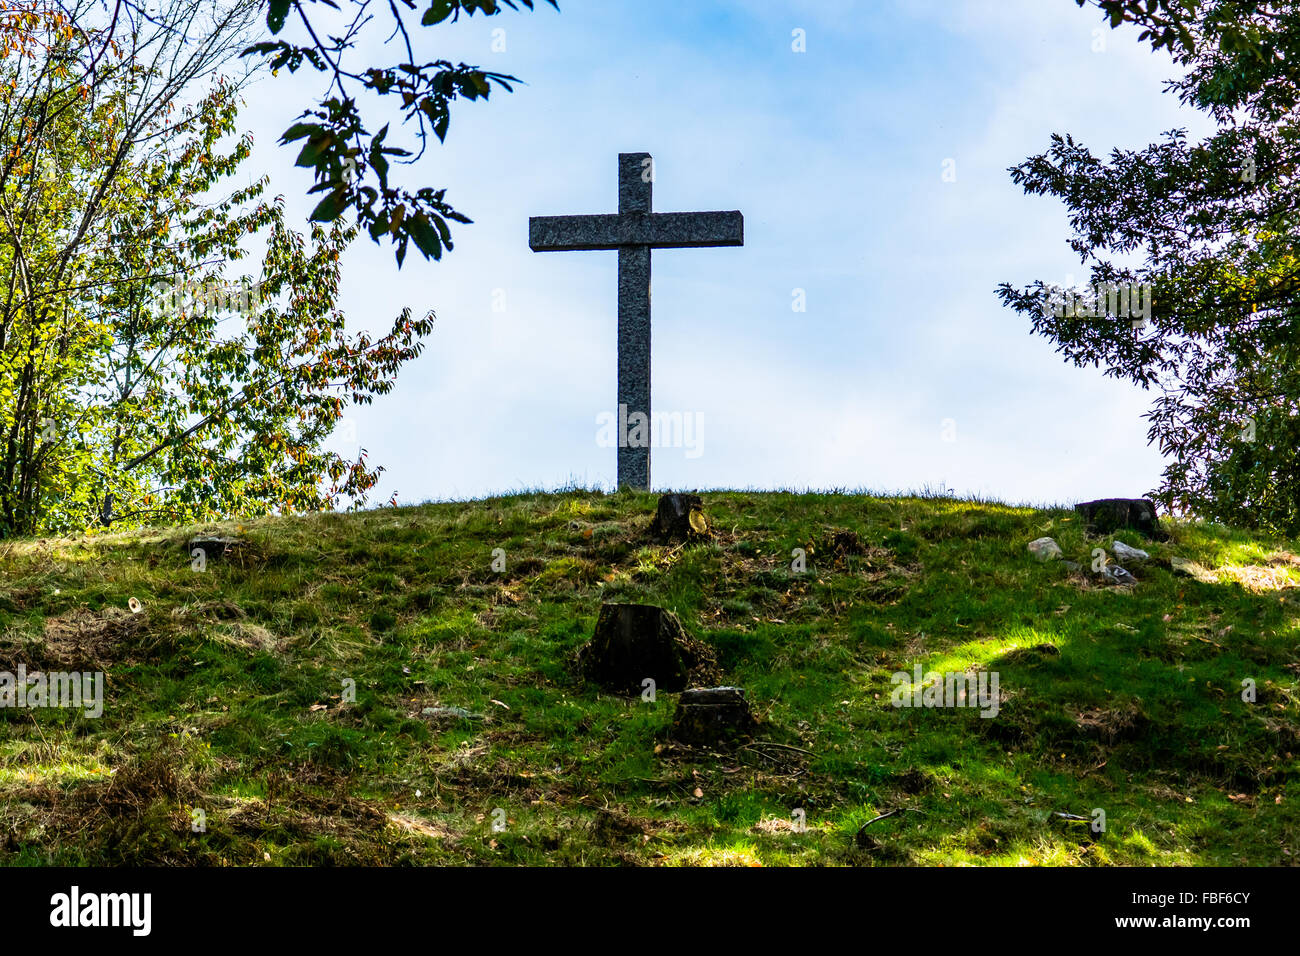 Niedrigen Winkel Blick auf Kreuz auf auffangene gegen Himmel Stockbild